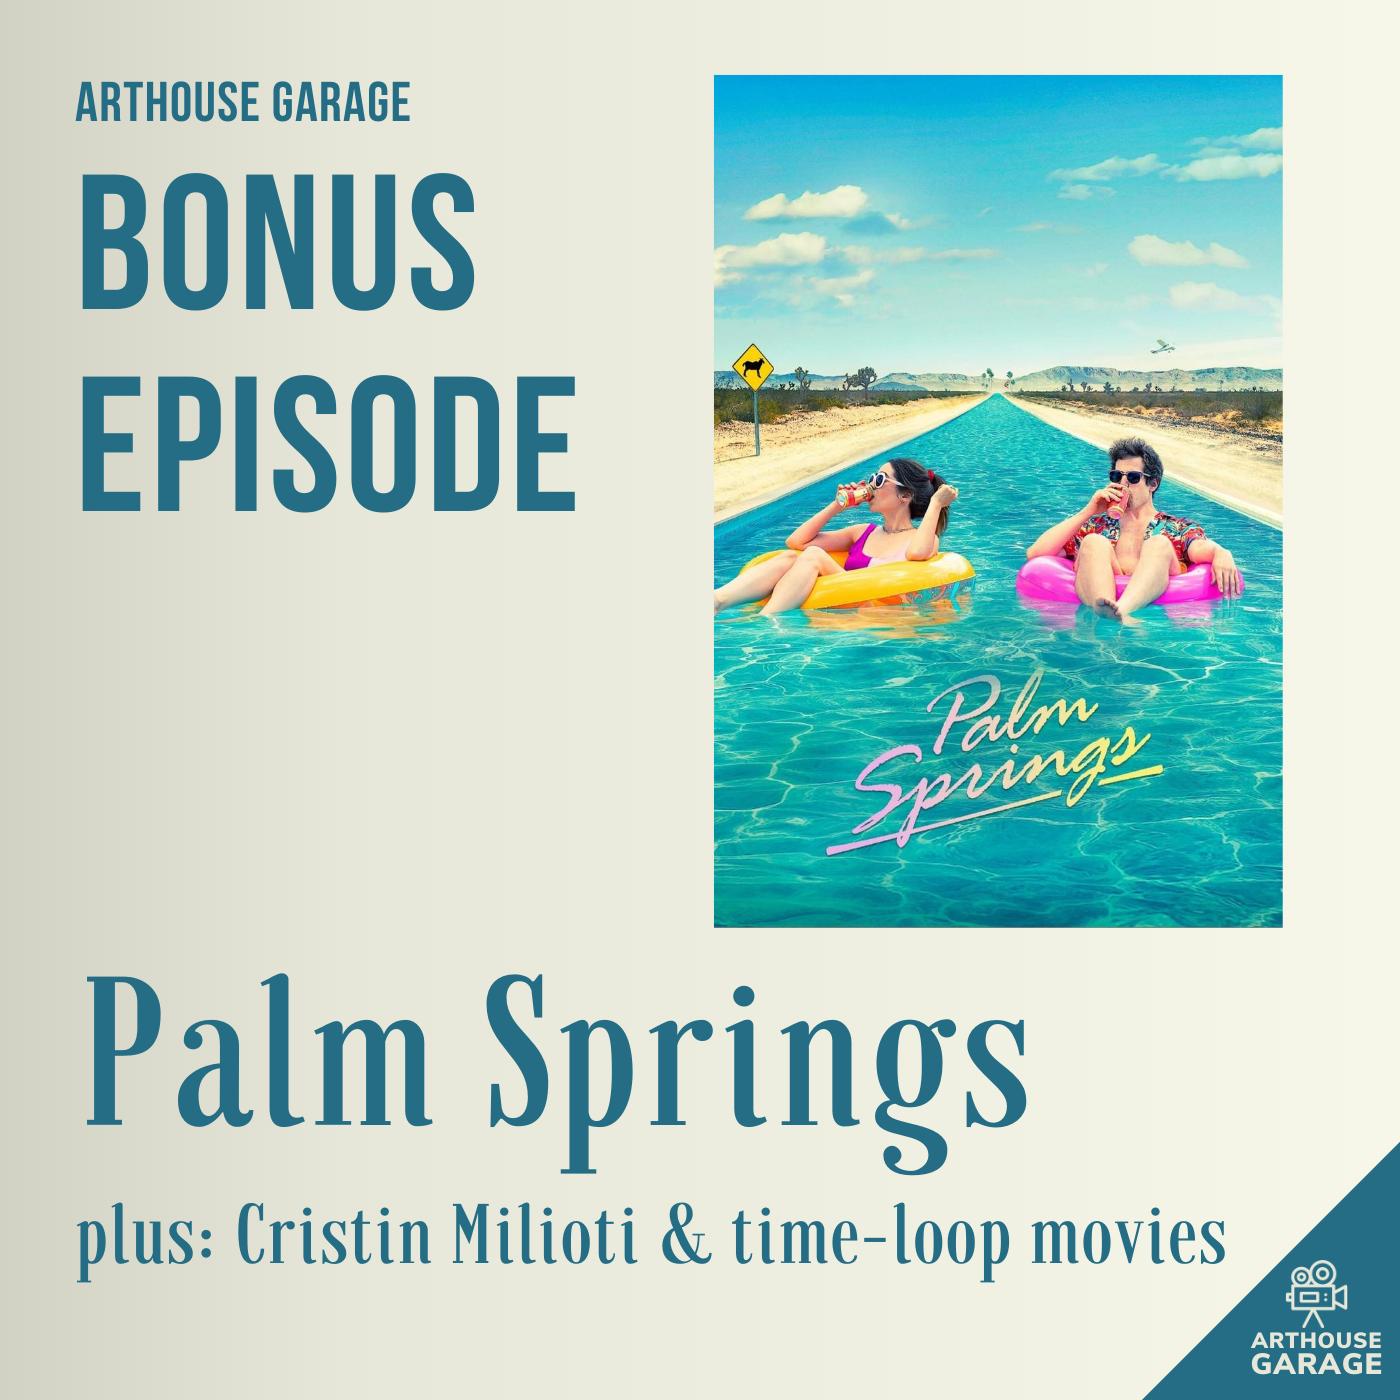 Bonus Episode: Palm Springs, Cristin Milioti & Time Loop Movies